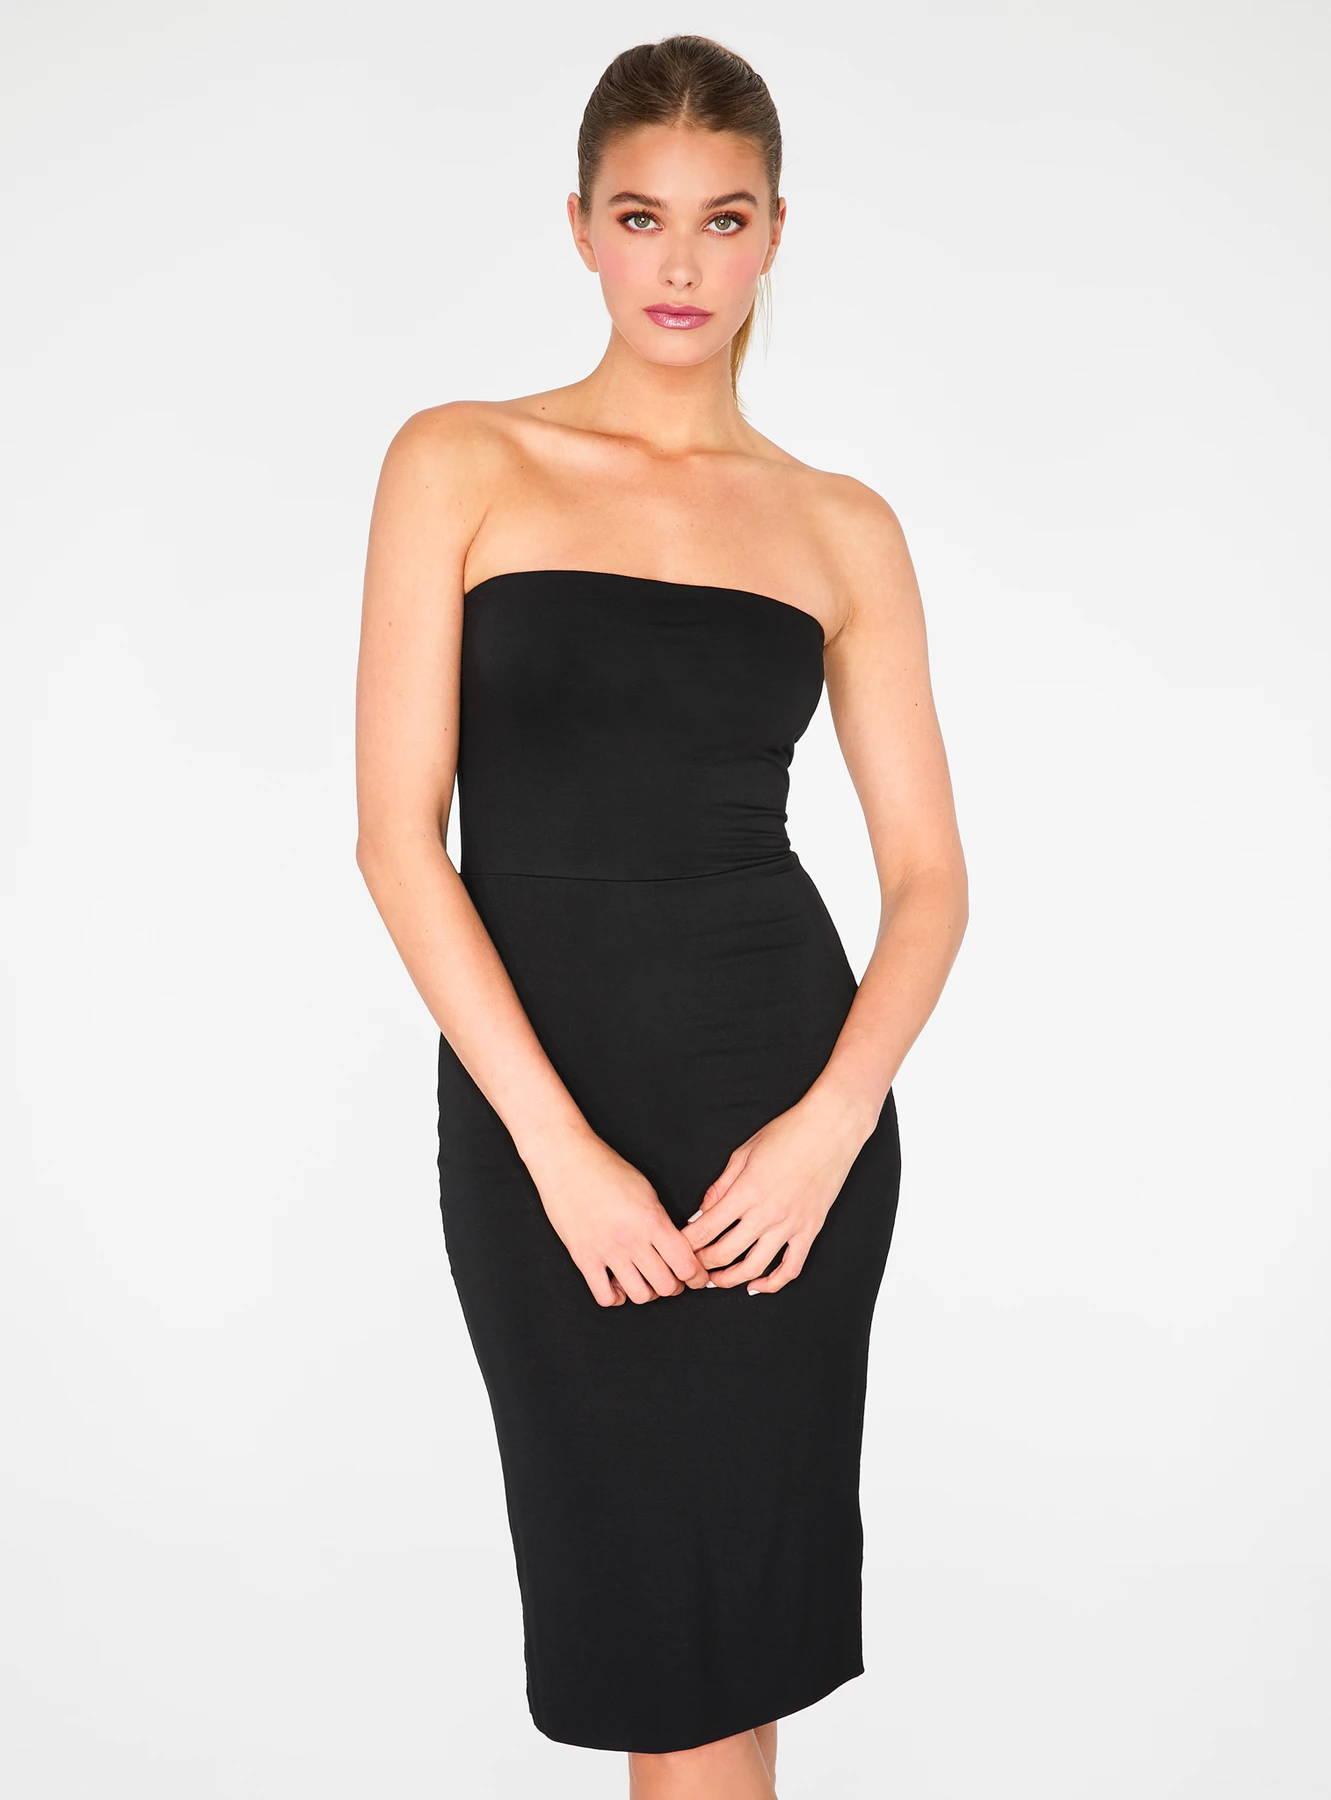 HeyYou Basic Black Strapless Midi Bodycon Dress